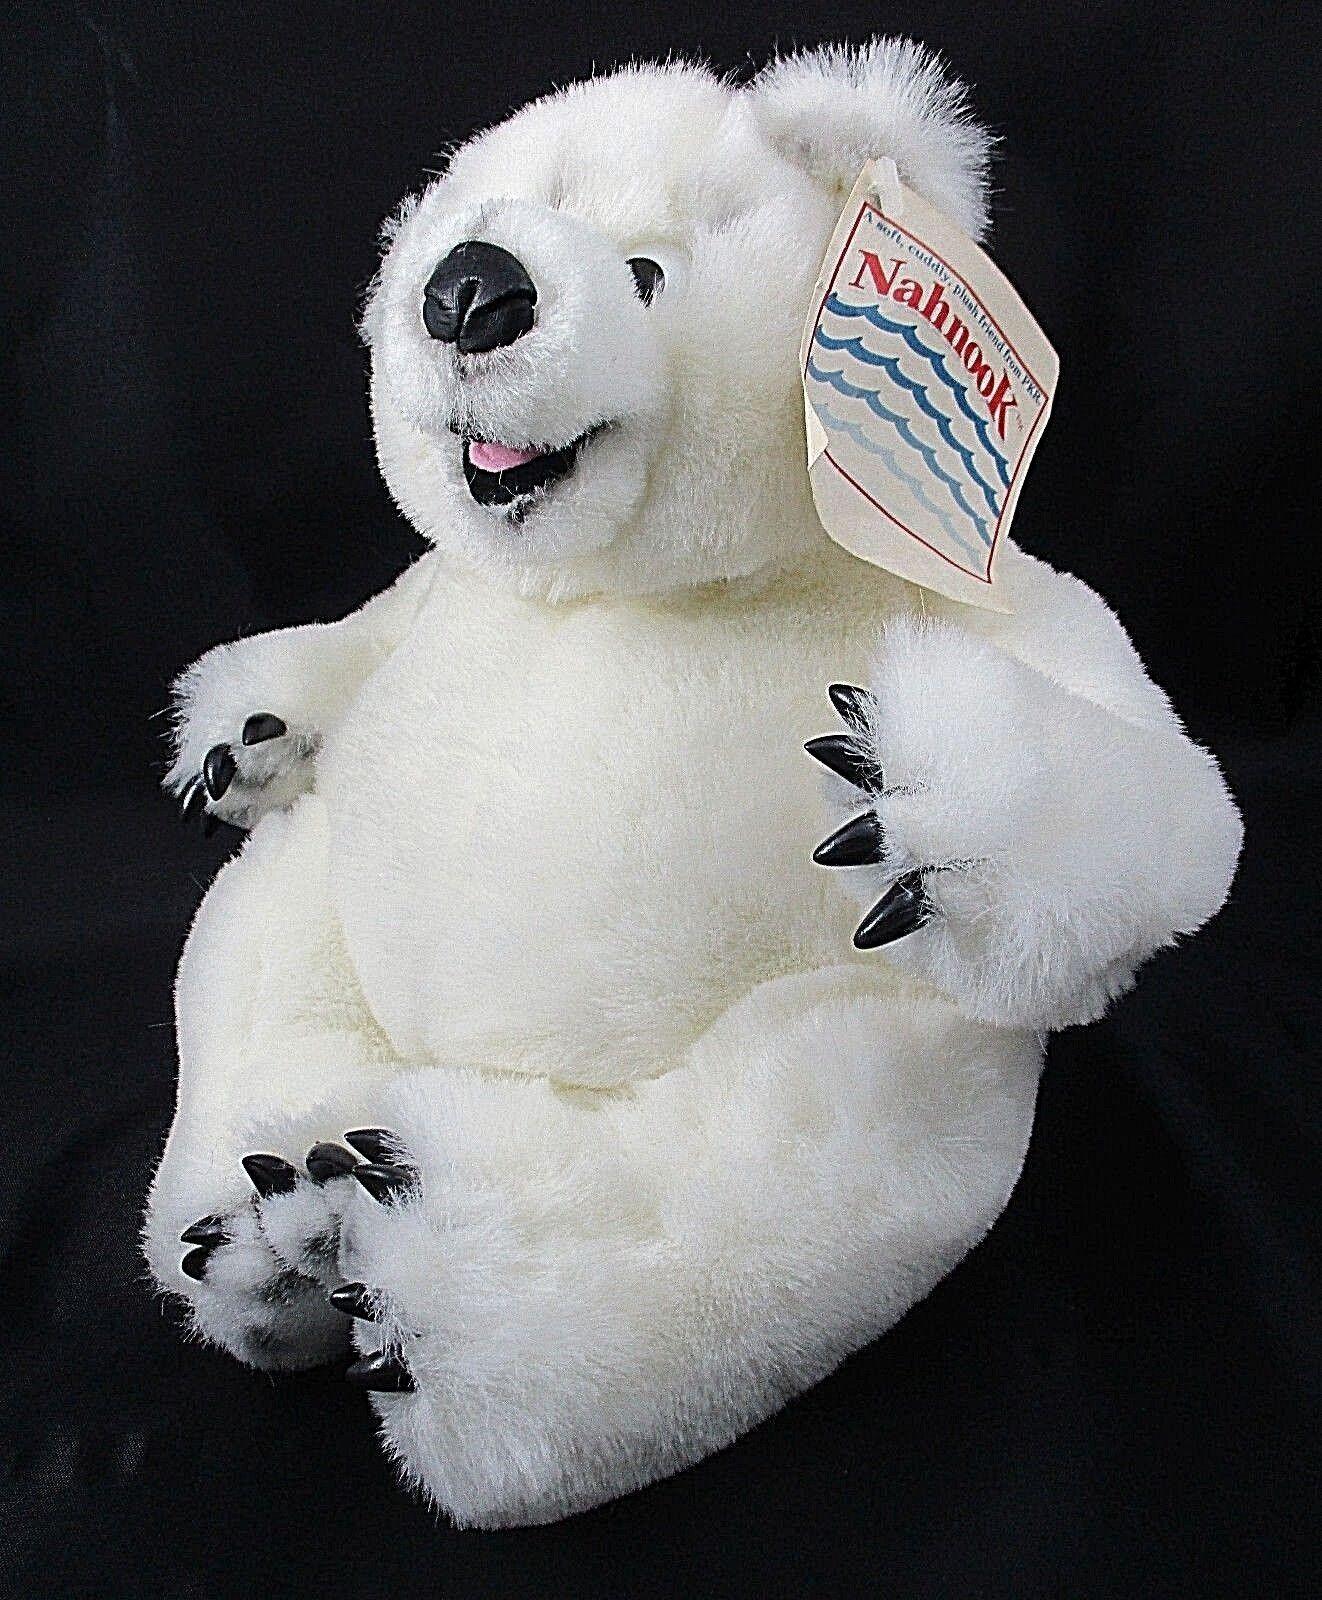 Nahnook Plush Polar Bear Nanook Abominable Snowman 1992 PKR Corporation Vintage